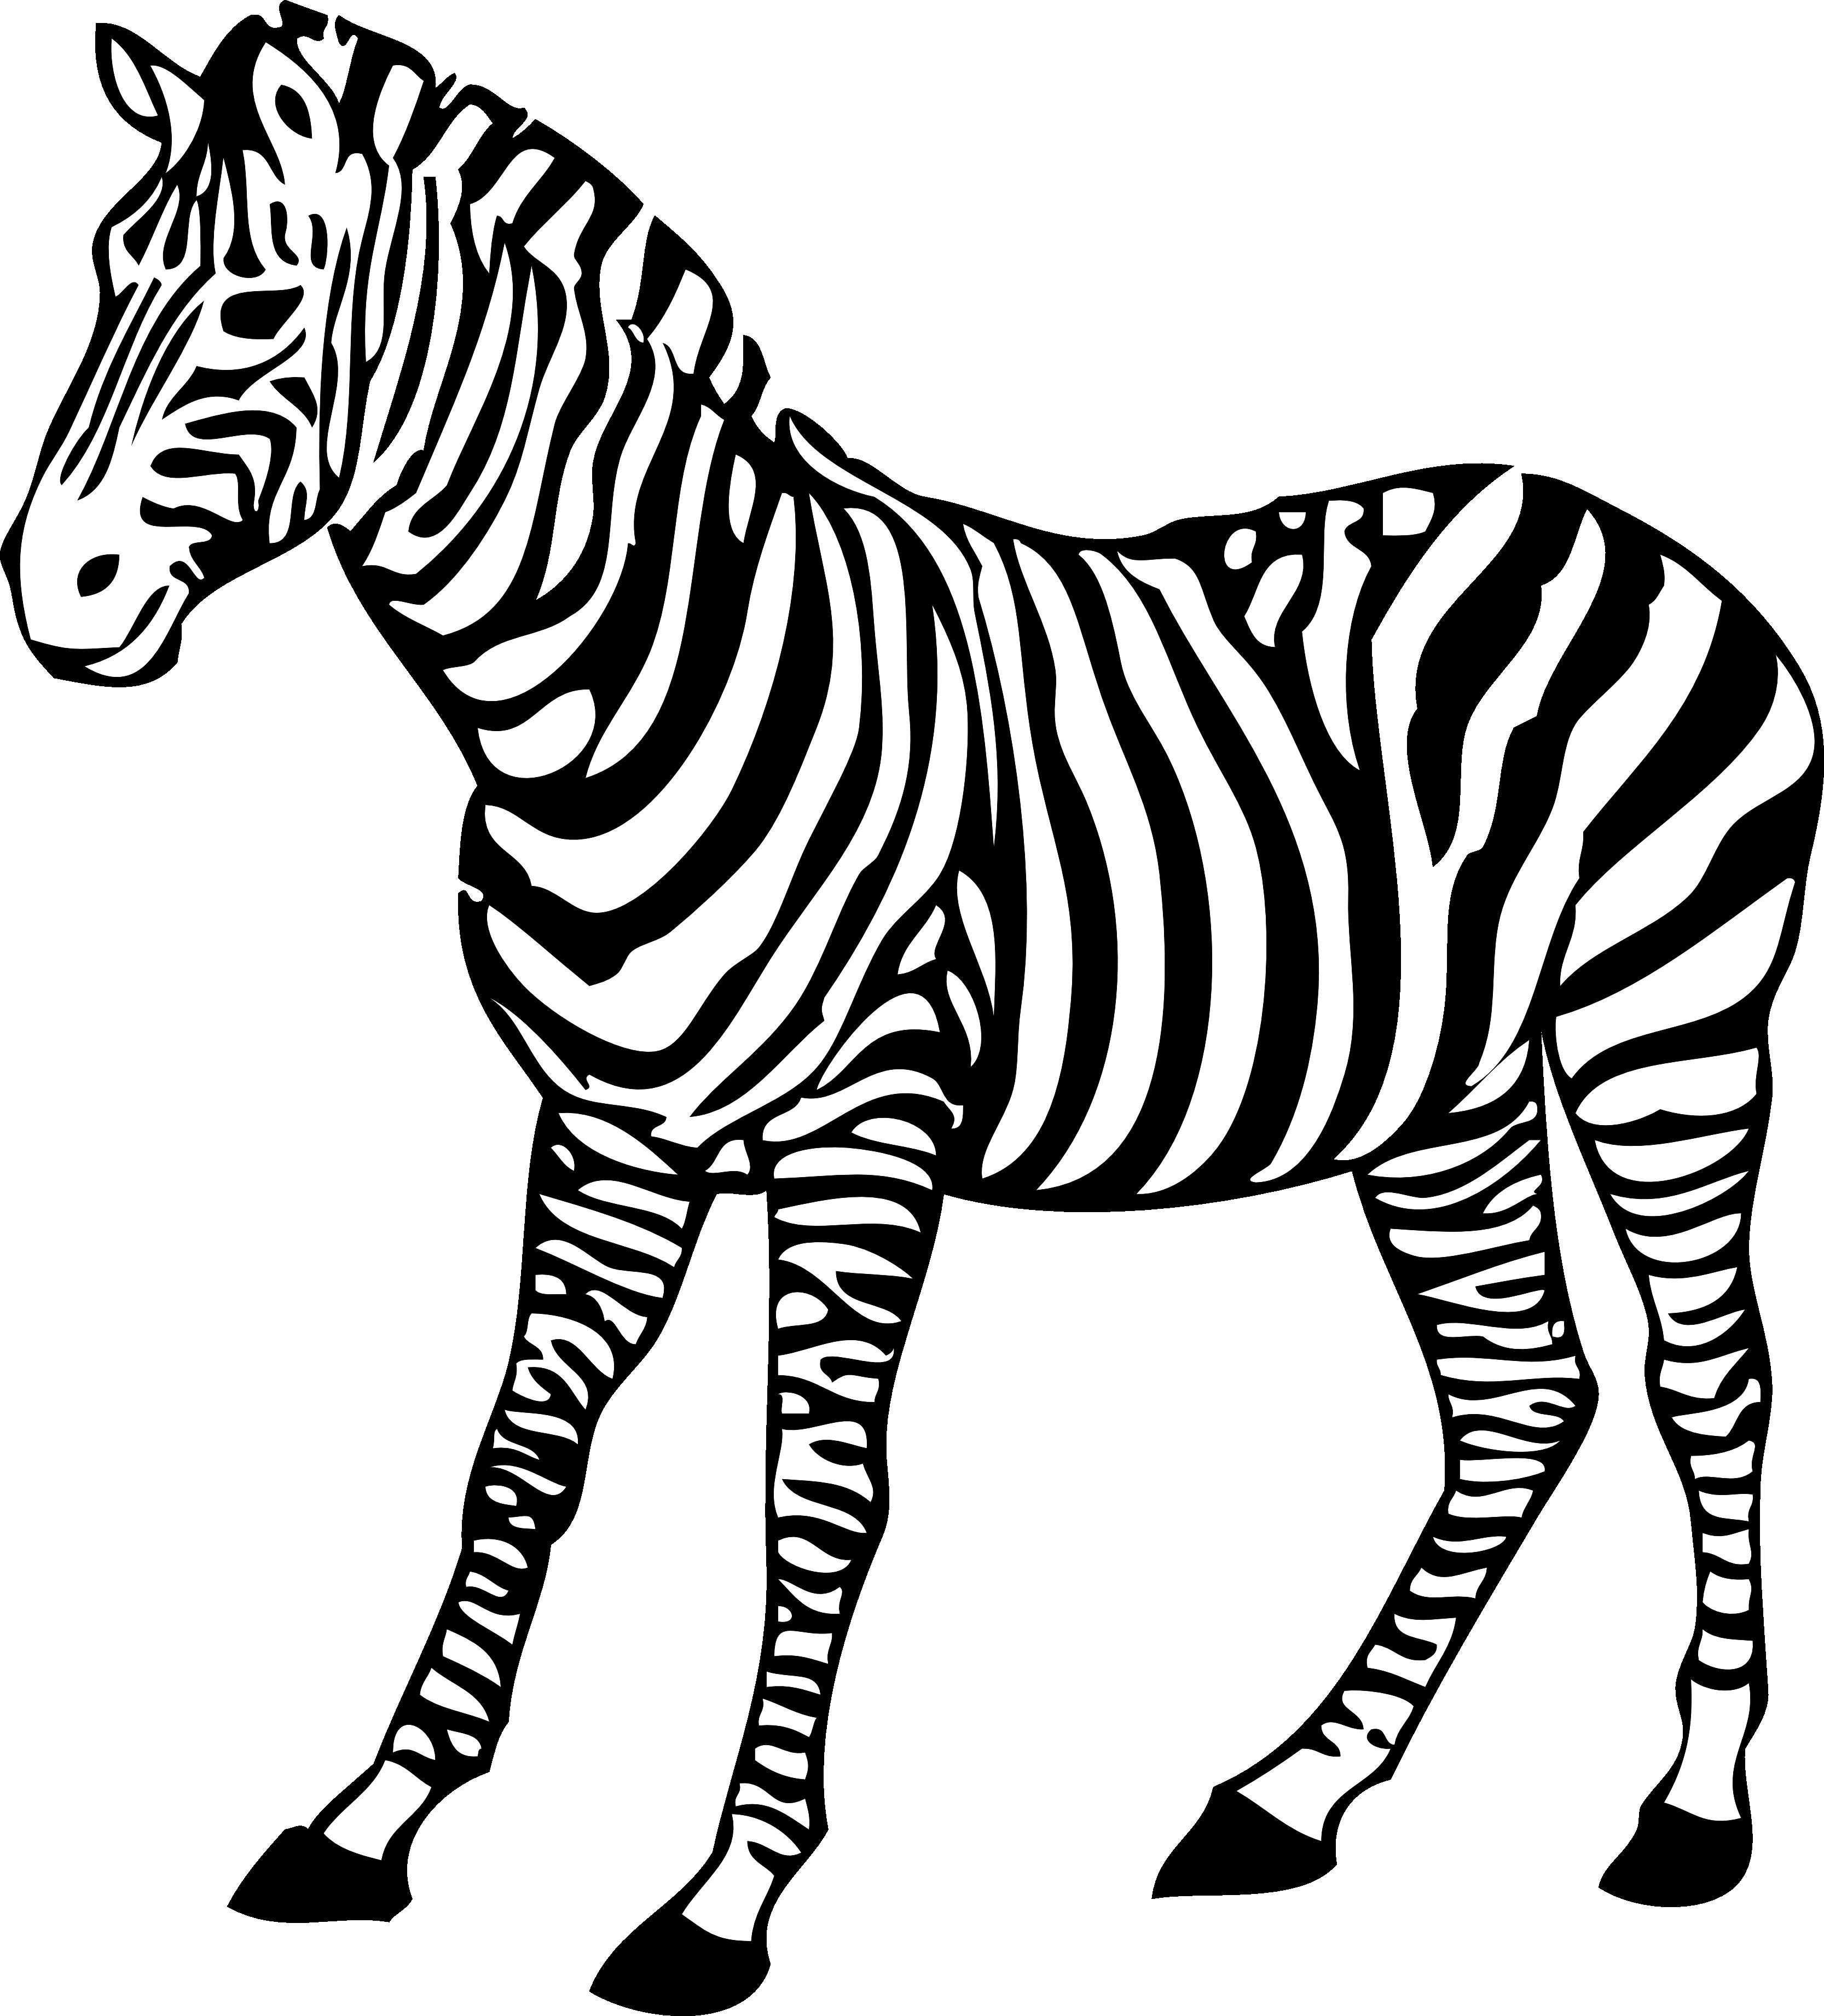 PlusPNG - Zebra PNG